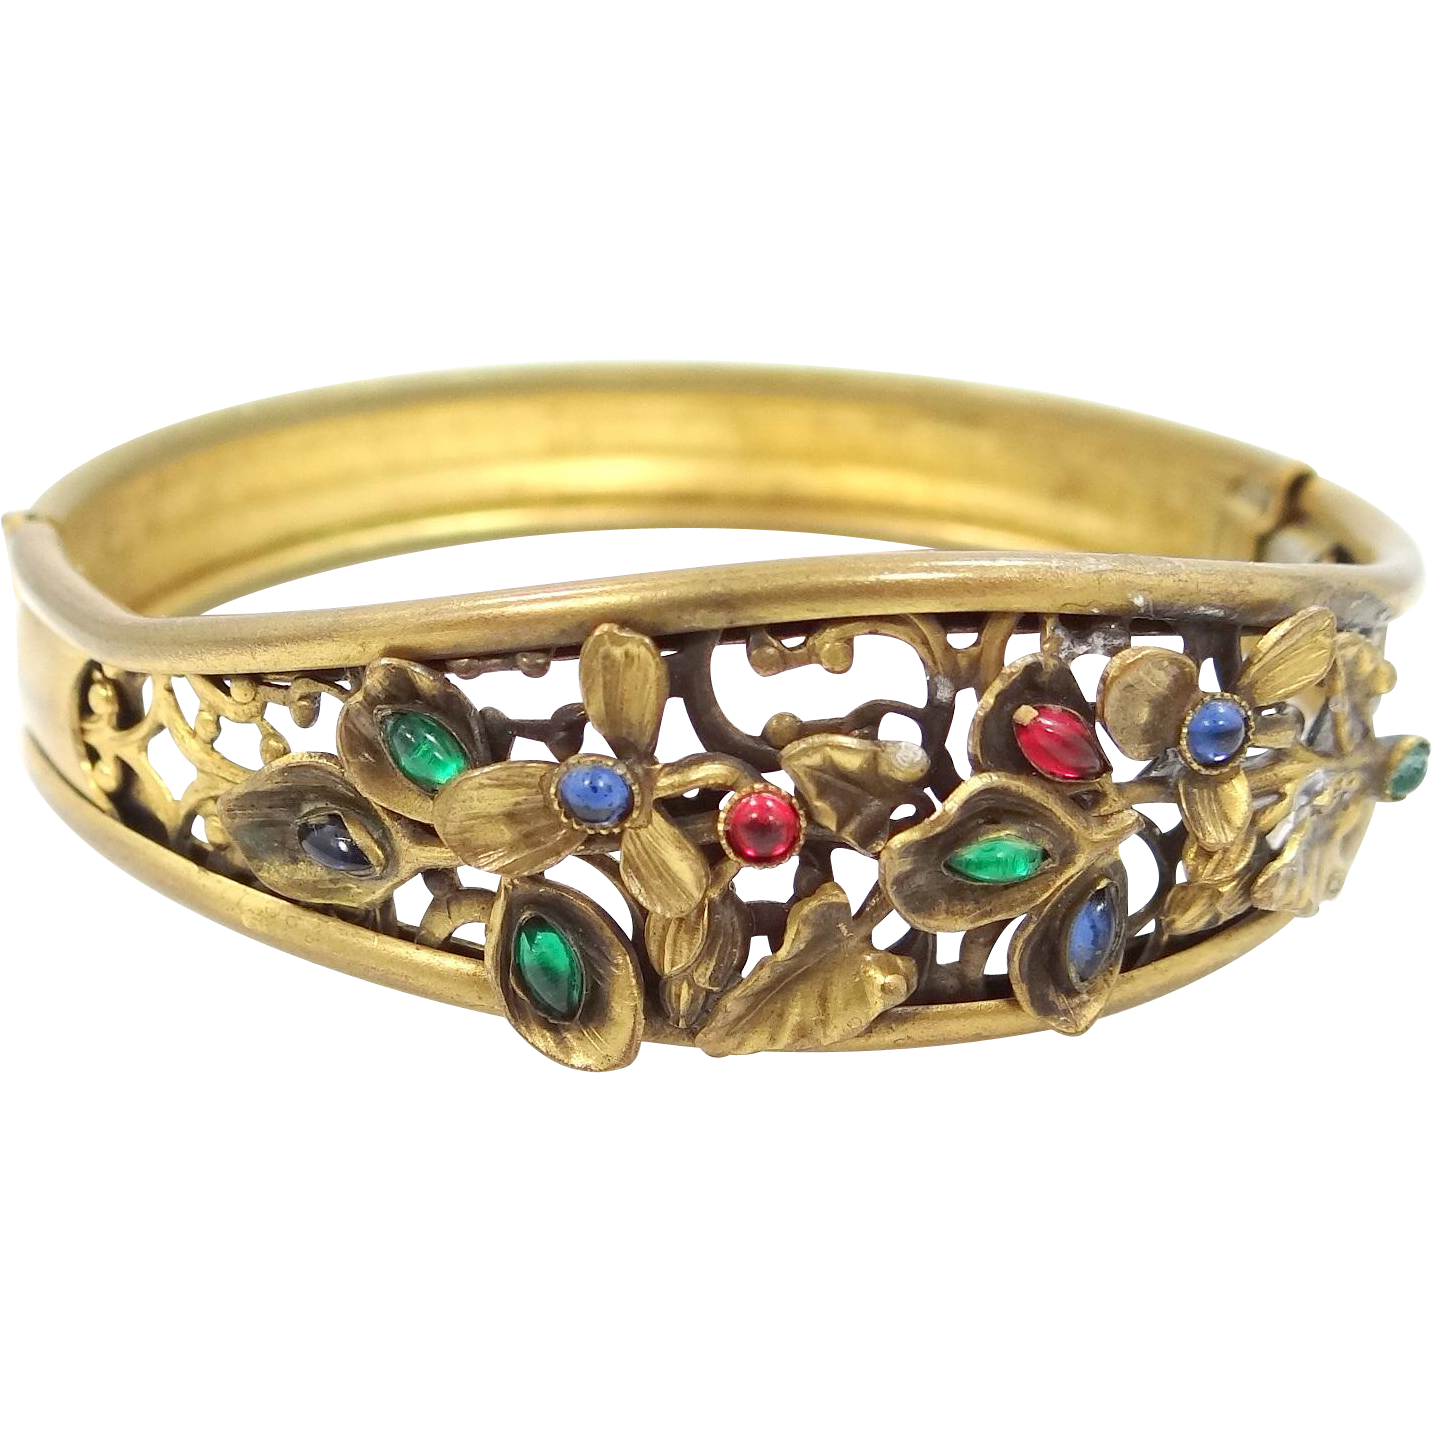 "1920s Coro ""Jeweled"" Filigree Bangle Bracelet"